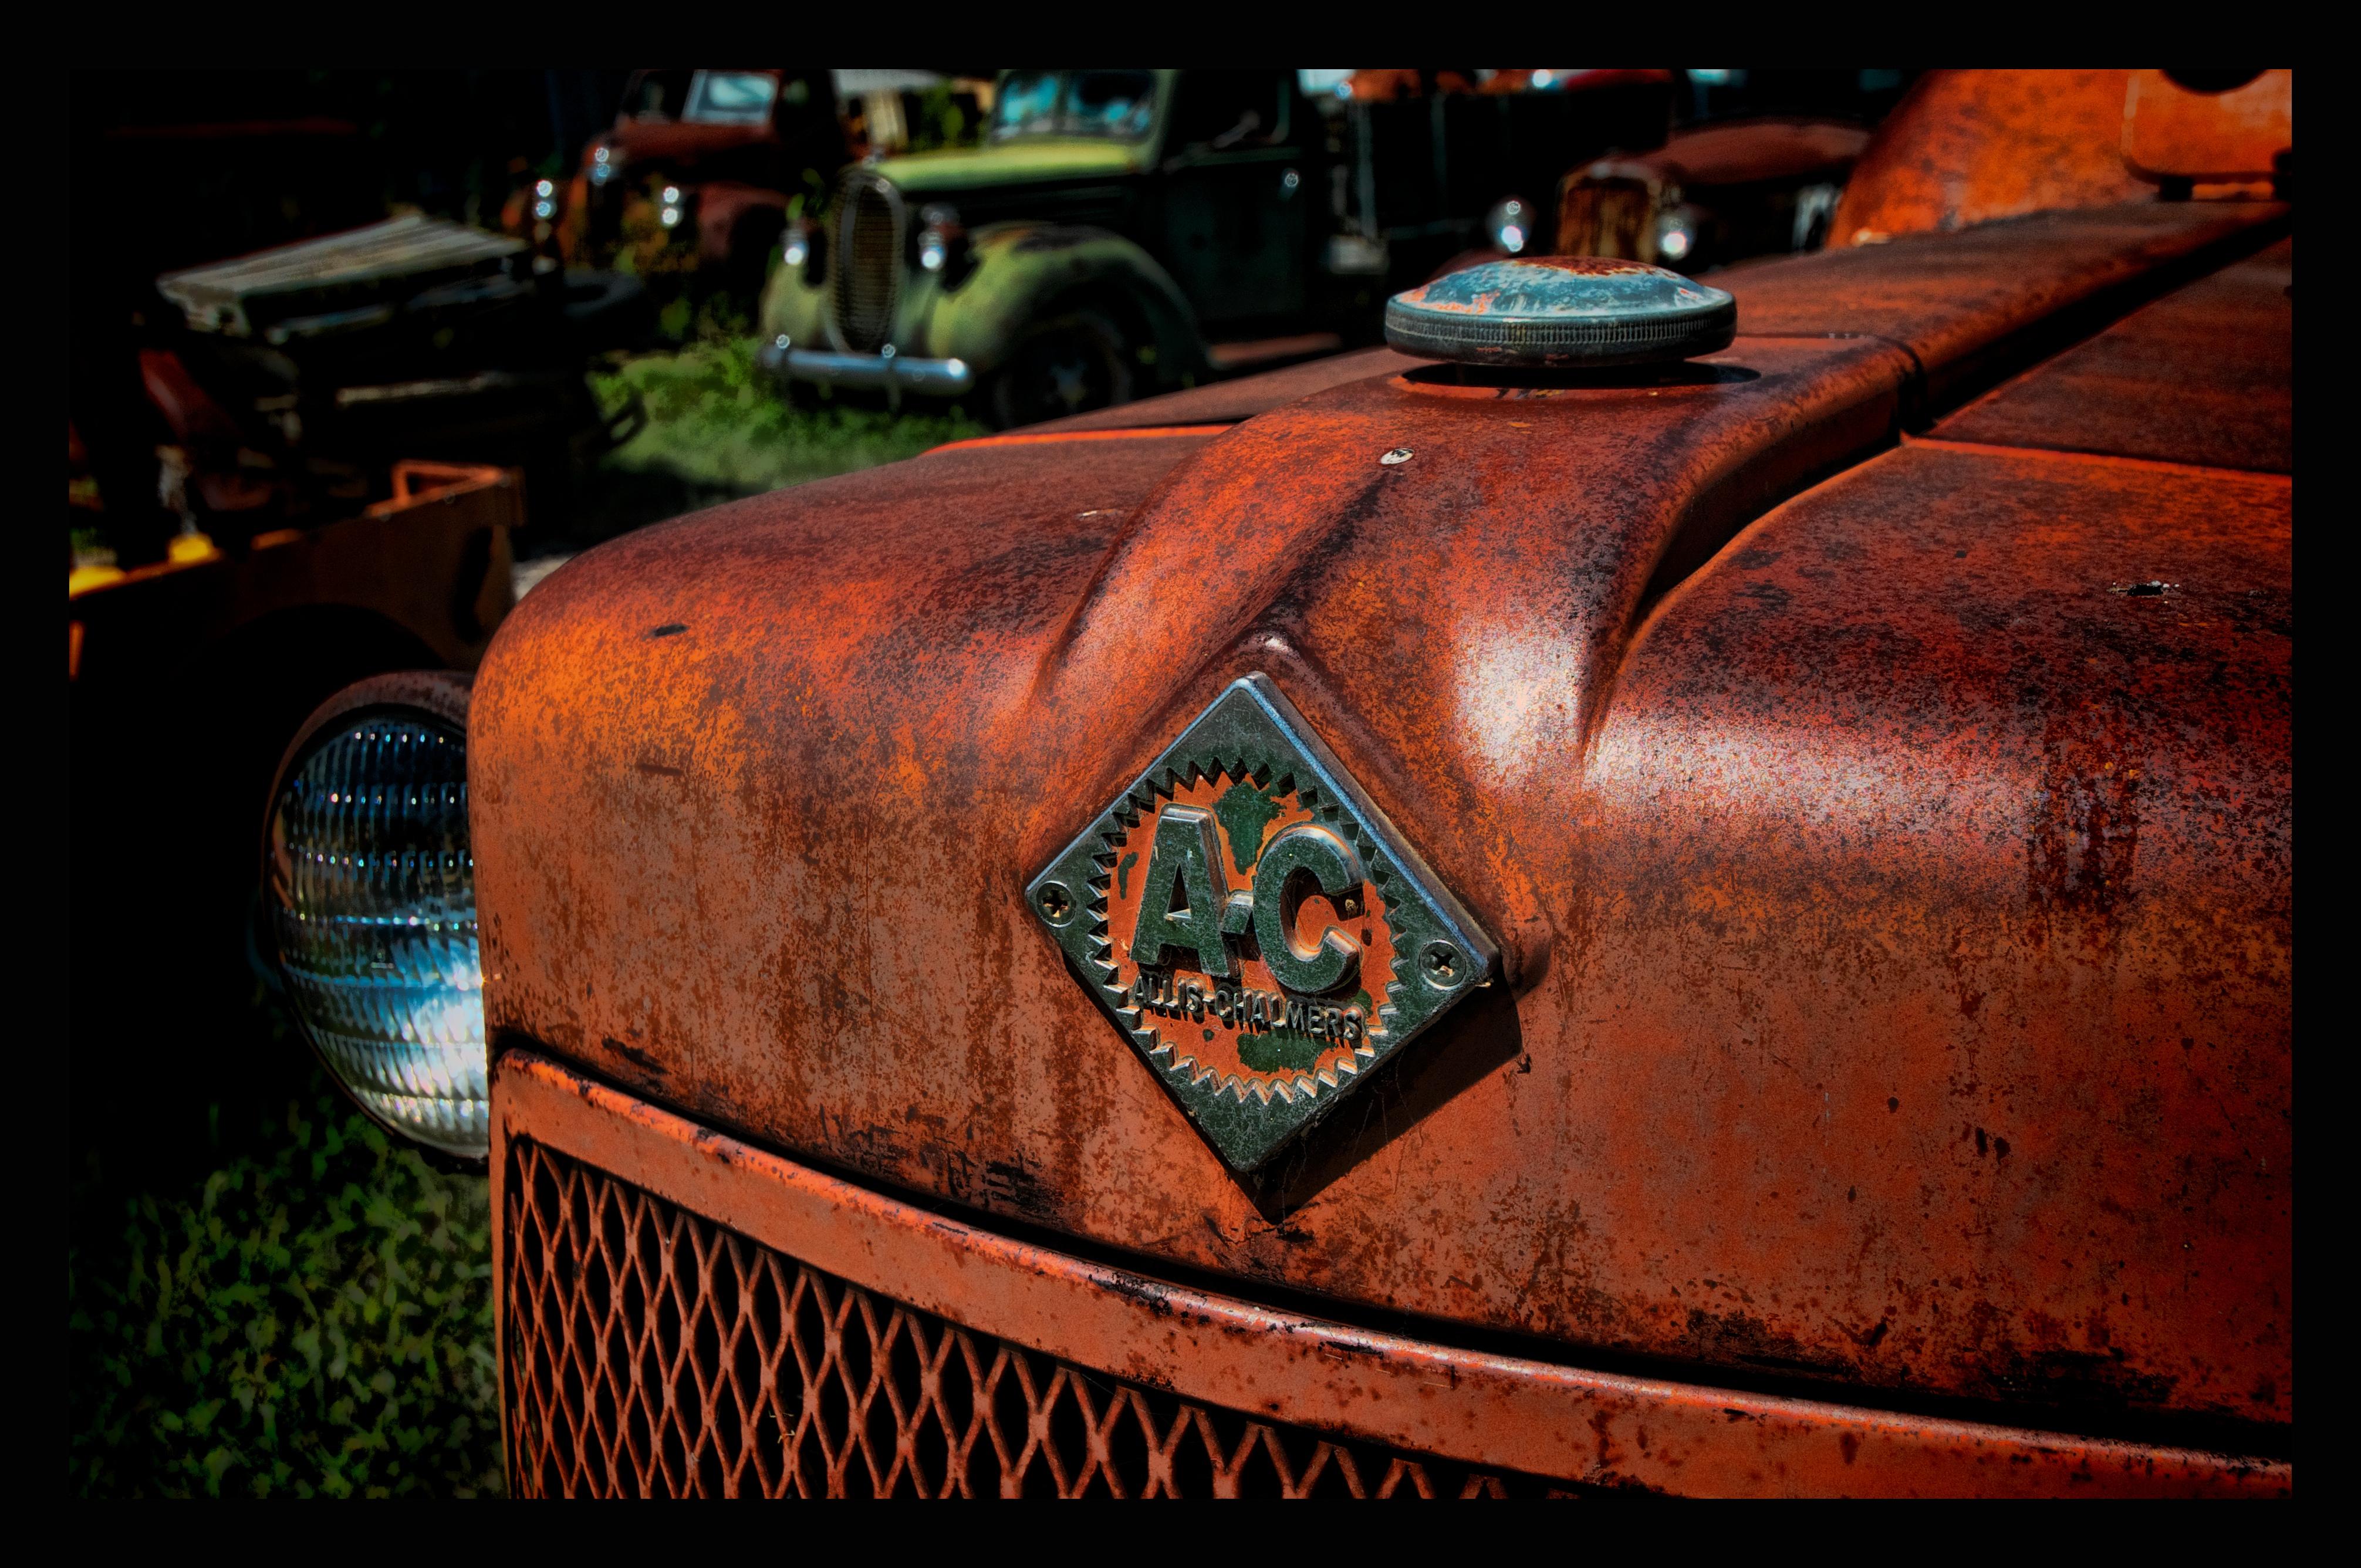 Kansas Tractor #2